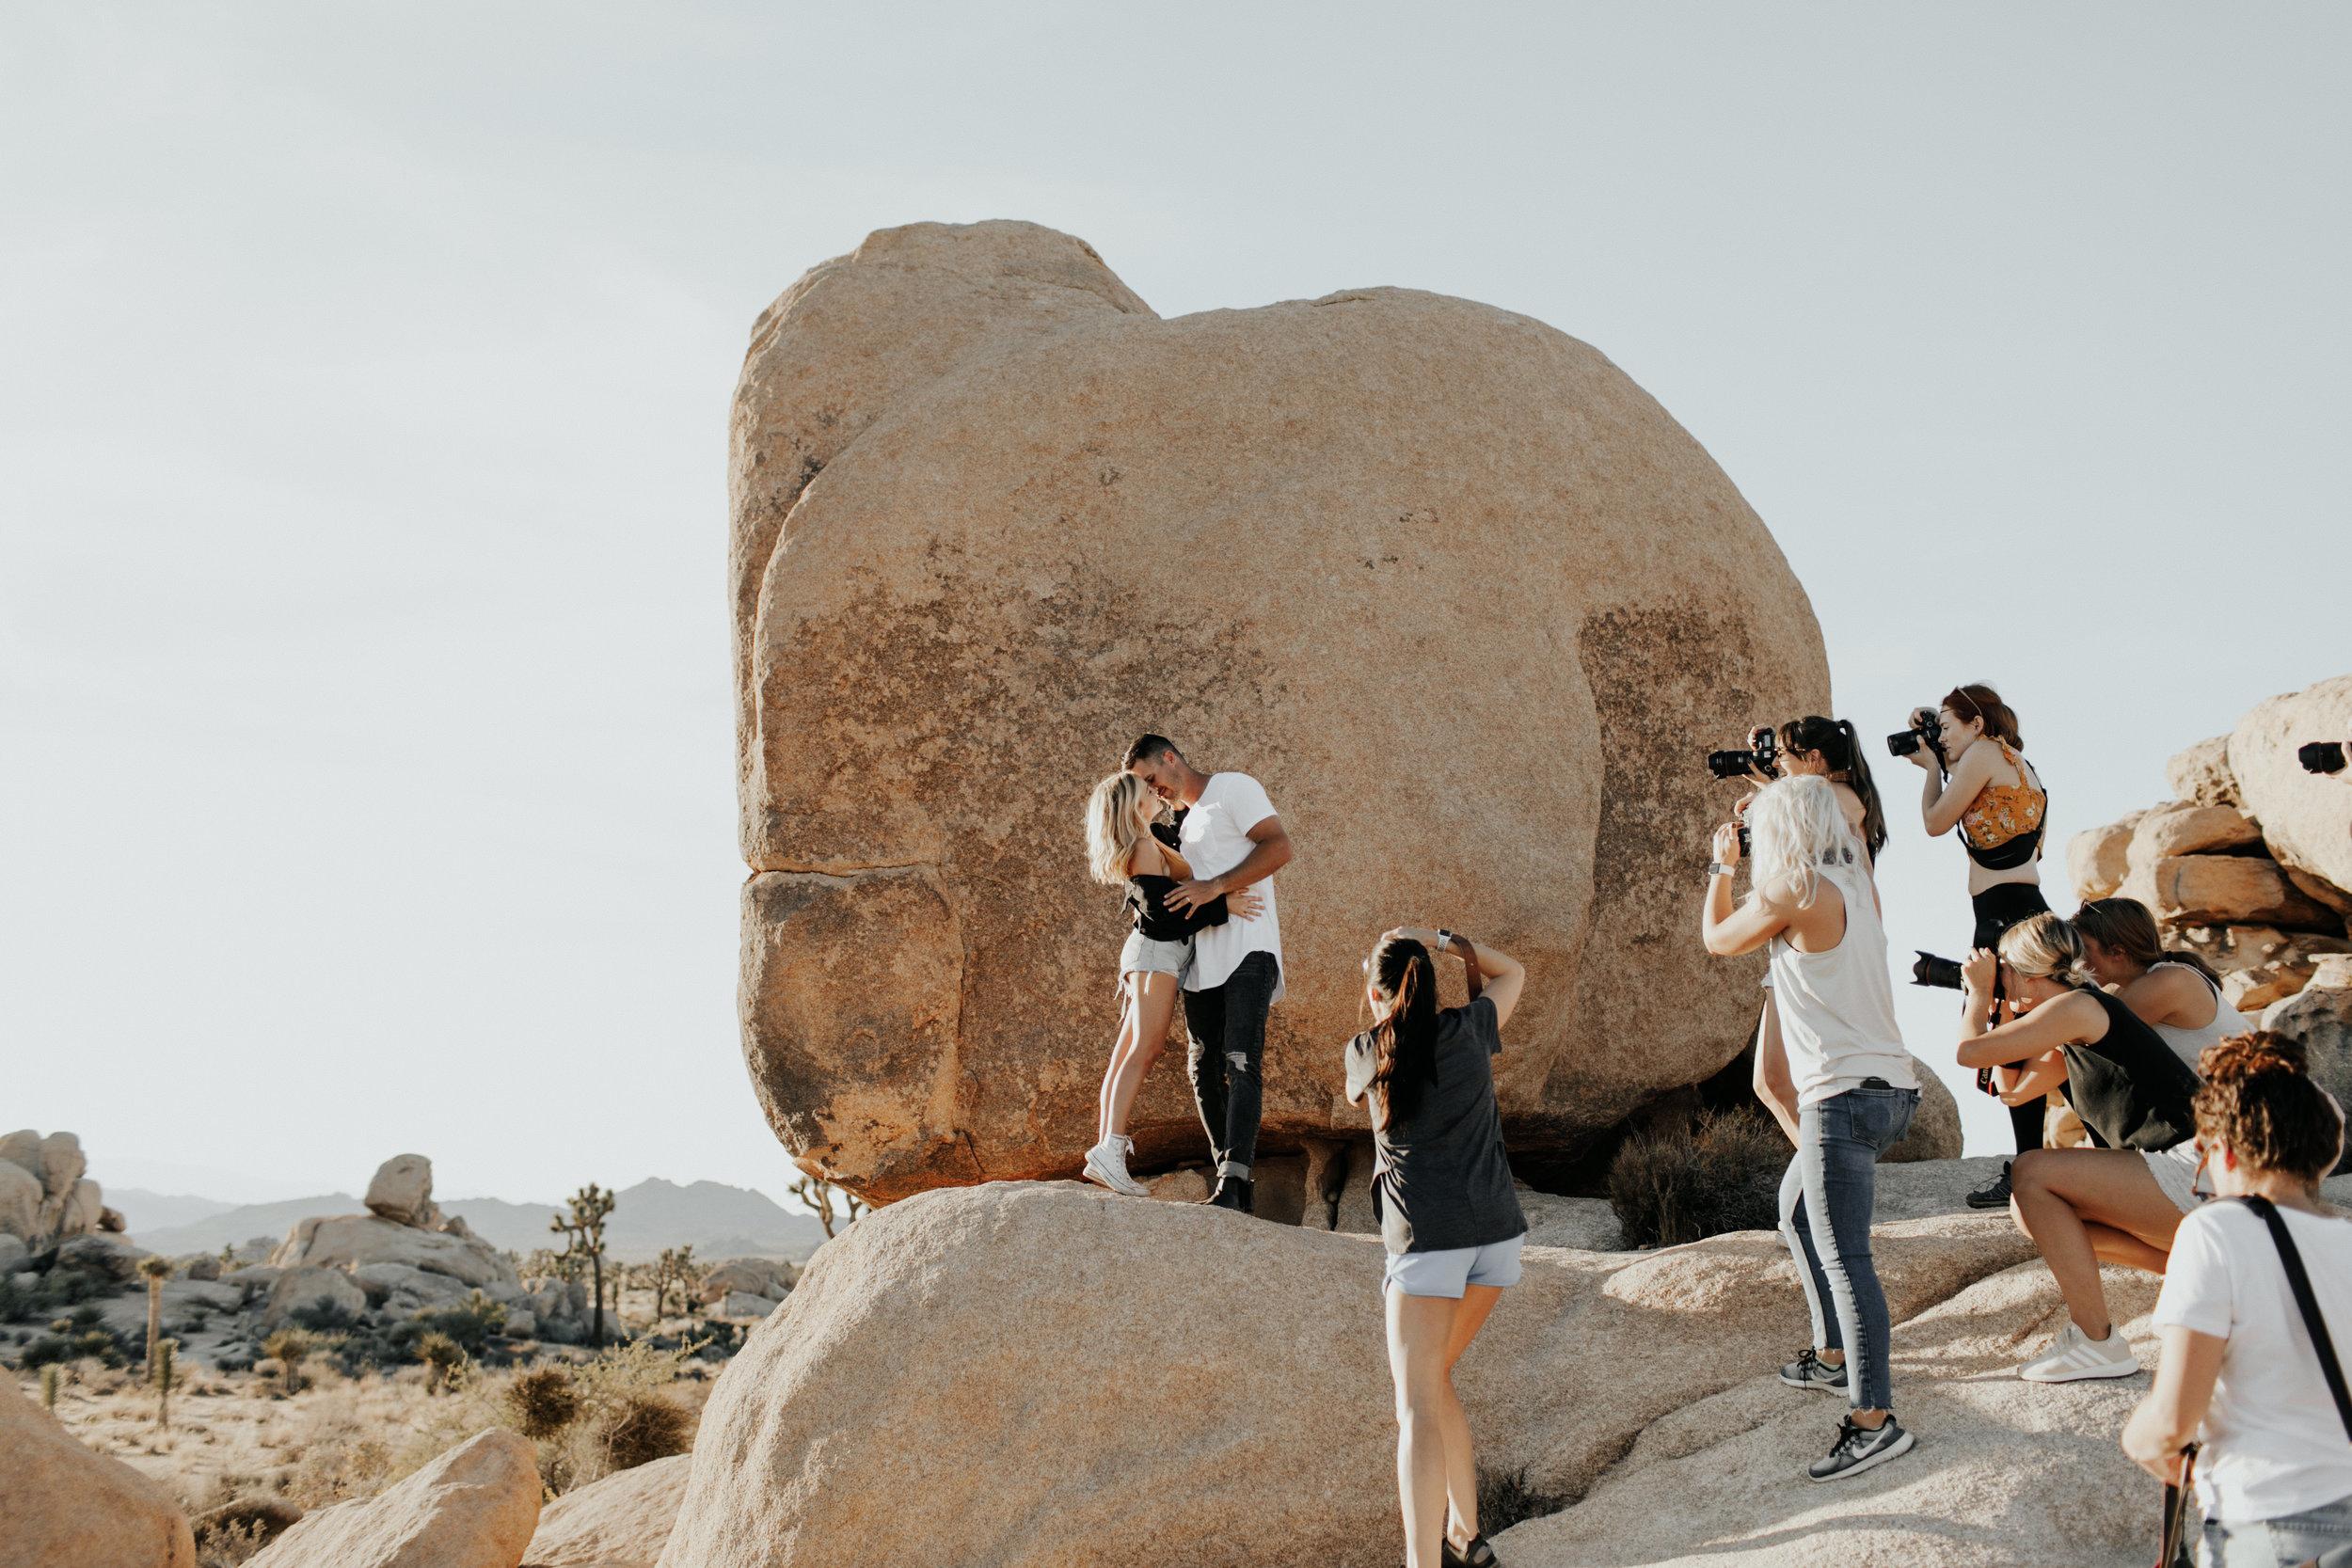 MelissaMarshall_Thrive Wildly Photography Workshop_1.jpg